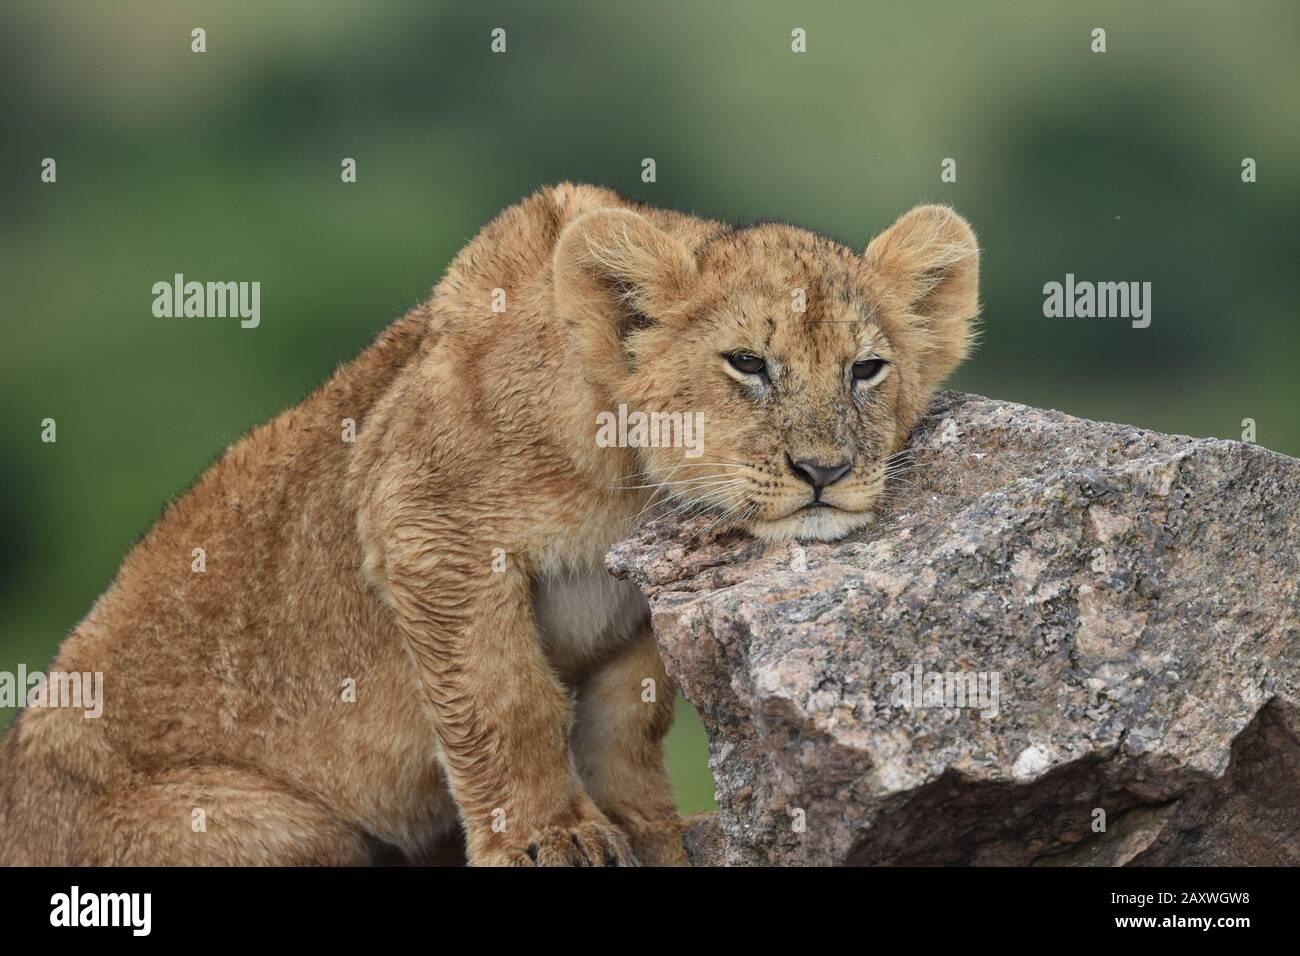 Lion Cub resting its head on rocks. Masai Mara National Park, Kenya. Stock Photo